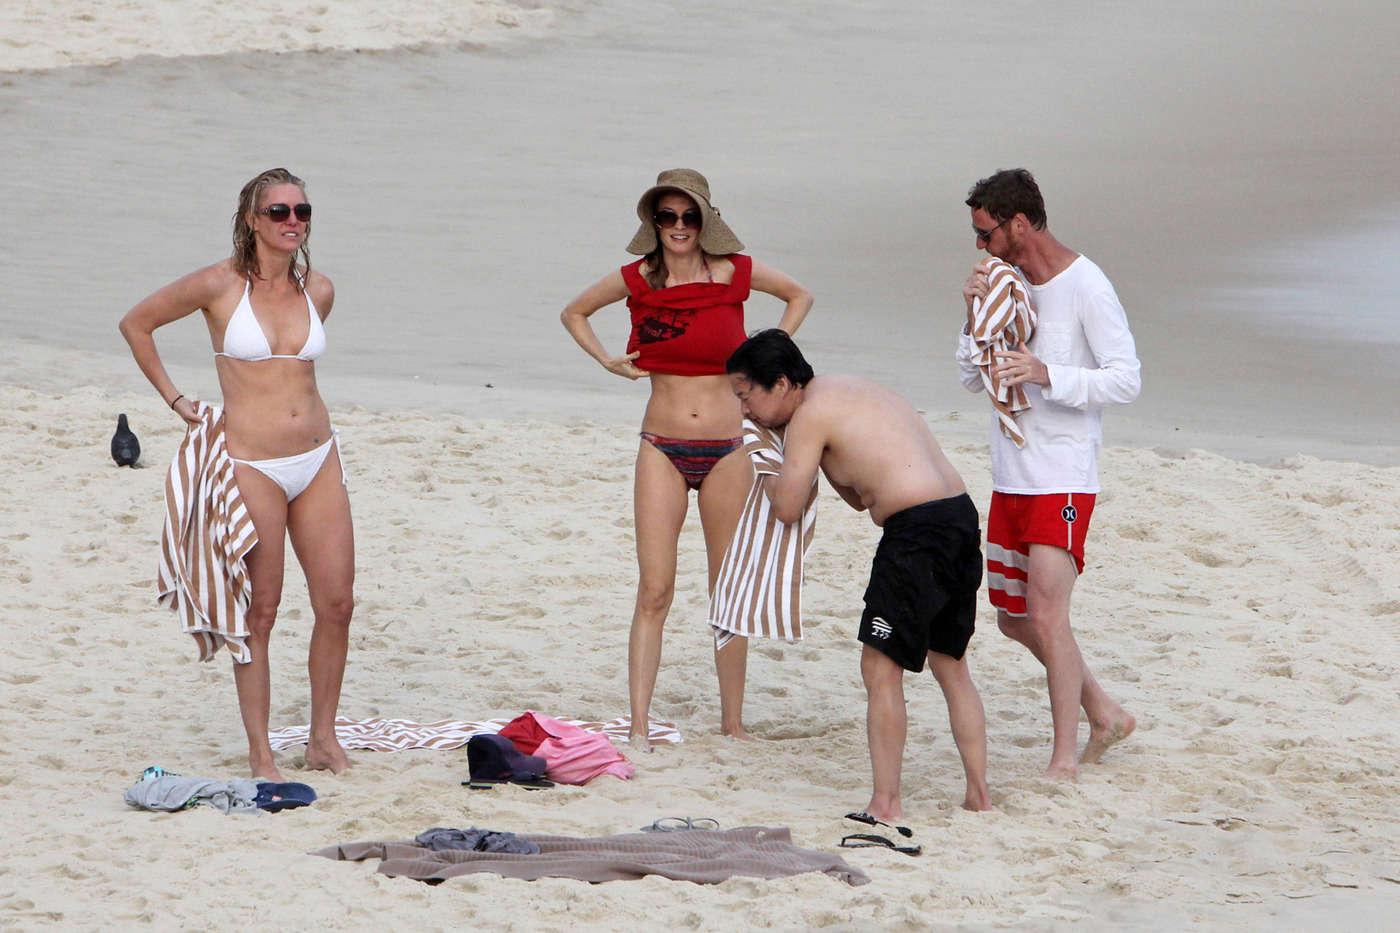 Bradley ShirtlessShows Off Brazil Cooper In Beach Body Goes 8wONnvm0